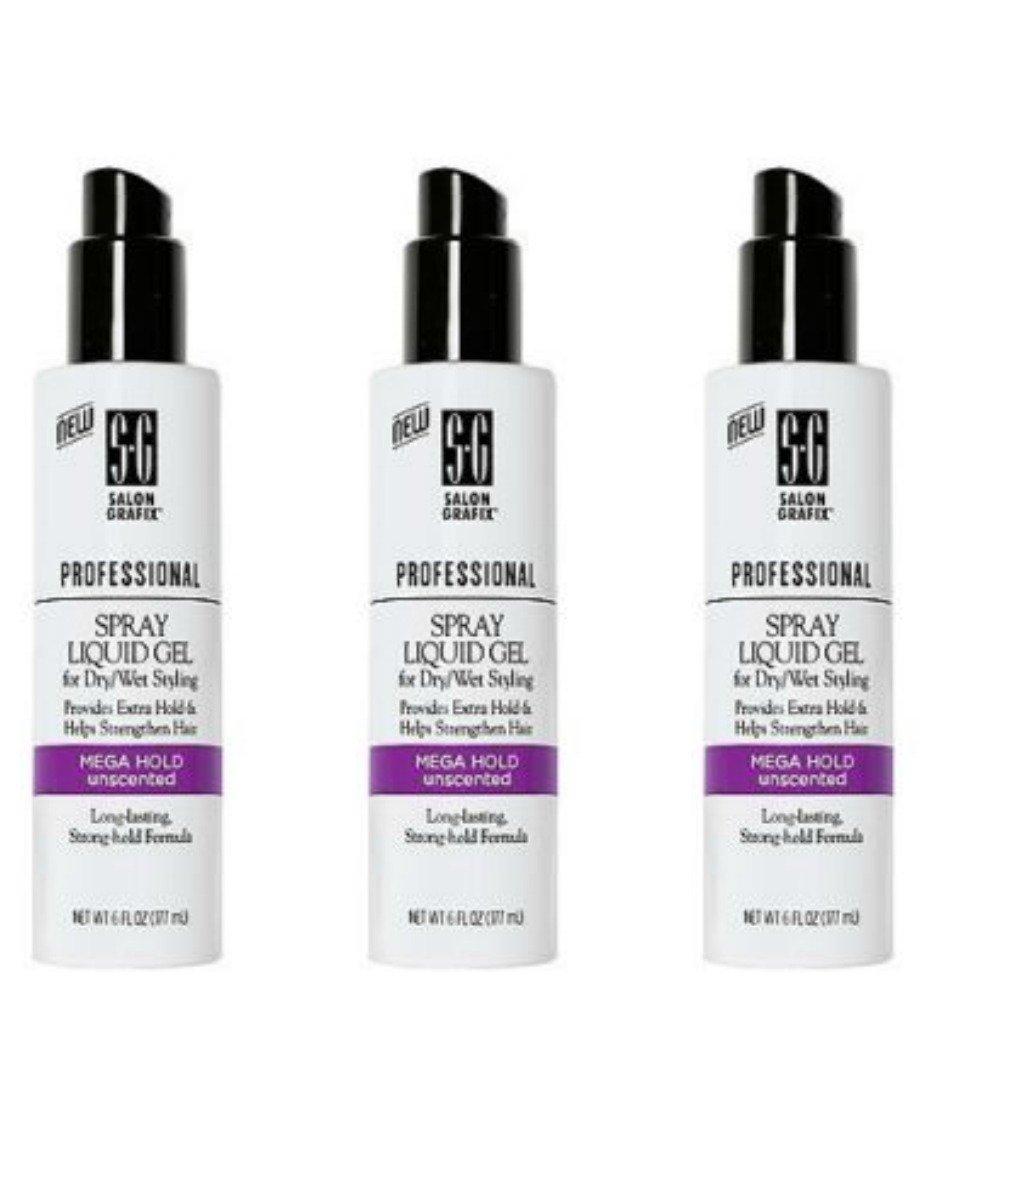 Salon Grafix Professional Spray Liquid Gel, Mega Hold, Unscented, 6 oz by Salon Grafix